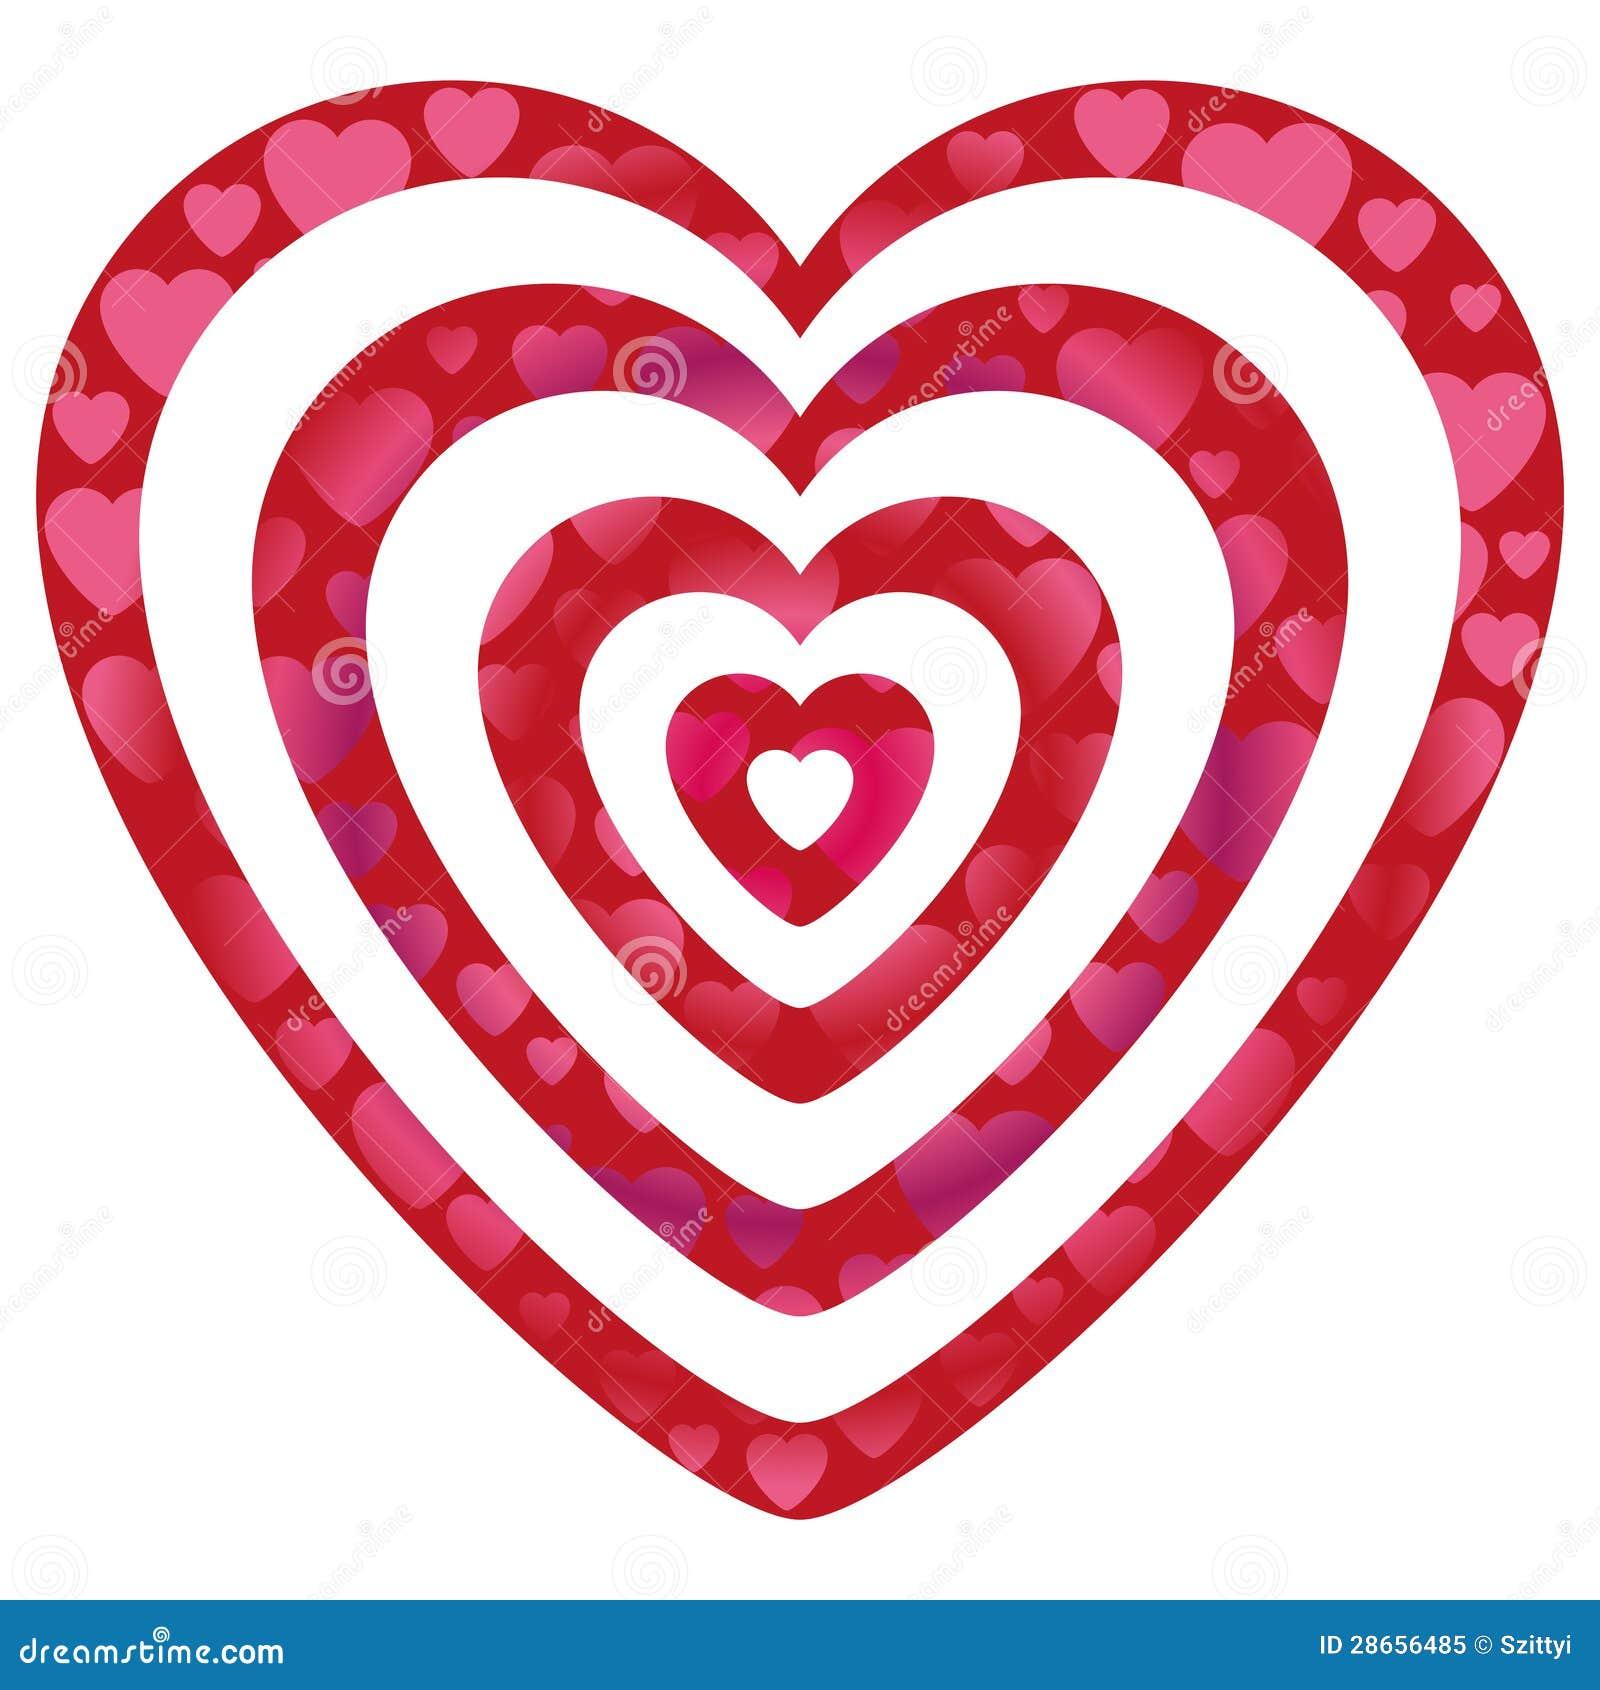 valentine hearts on heart shapes